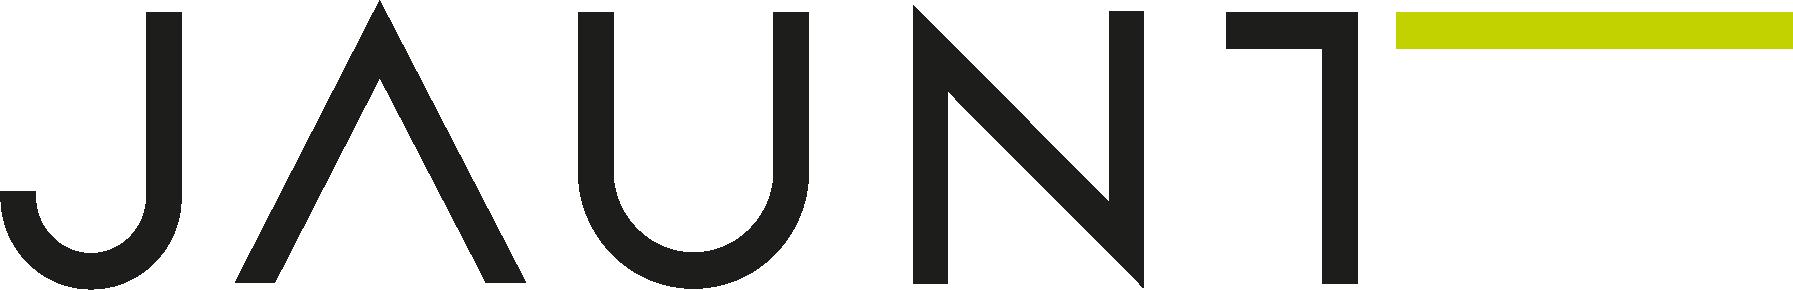 jaunt_logo.png